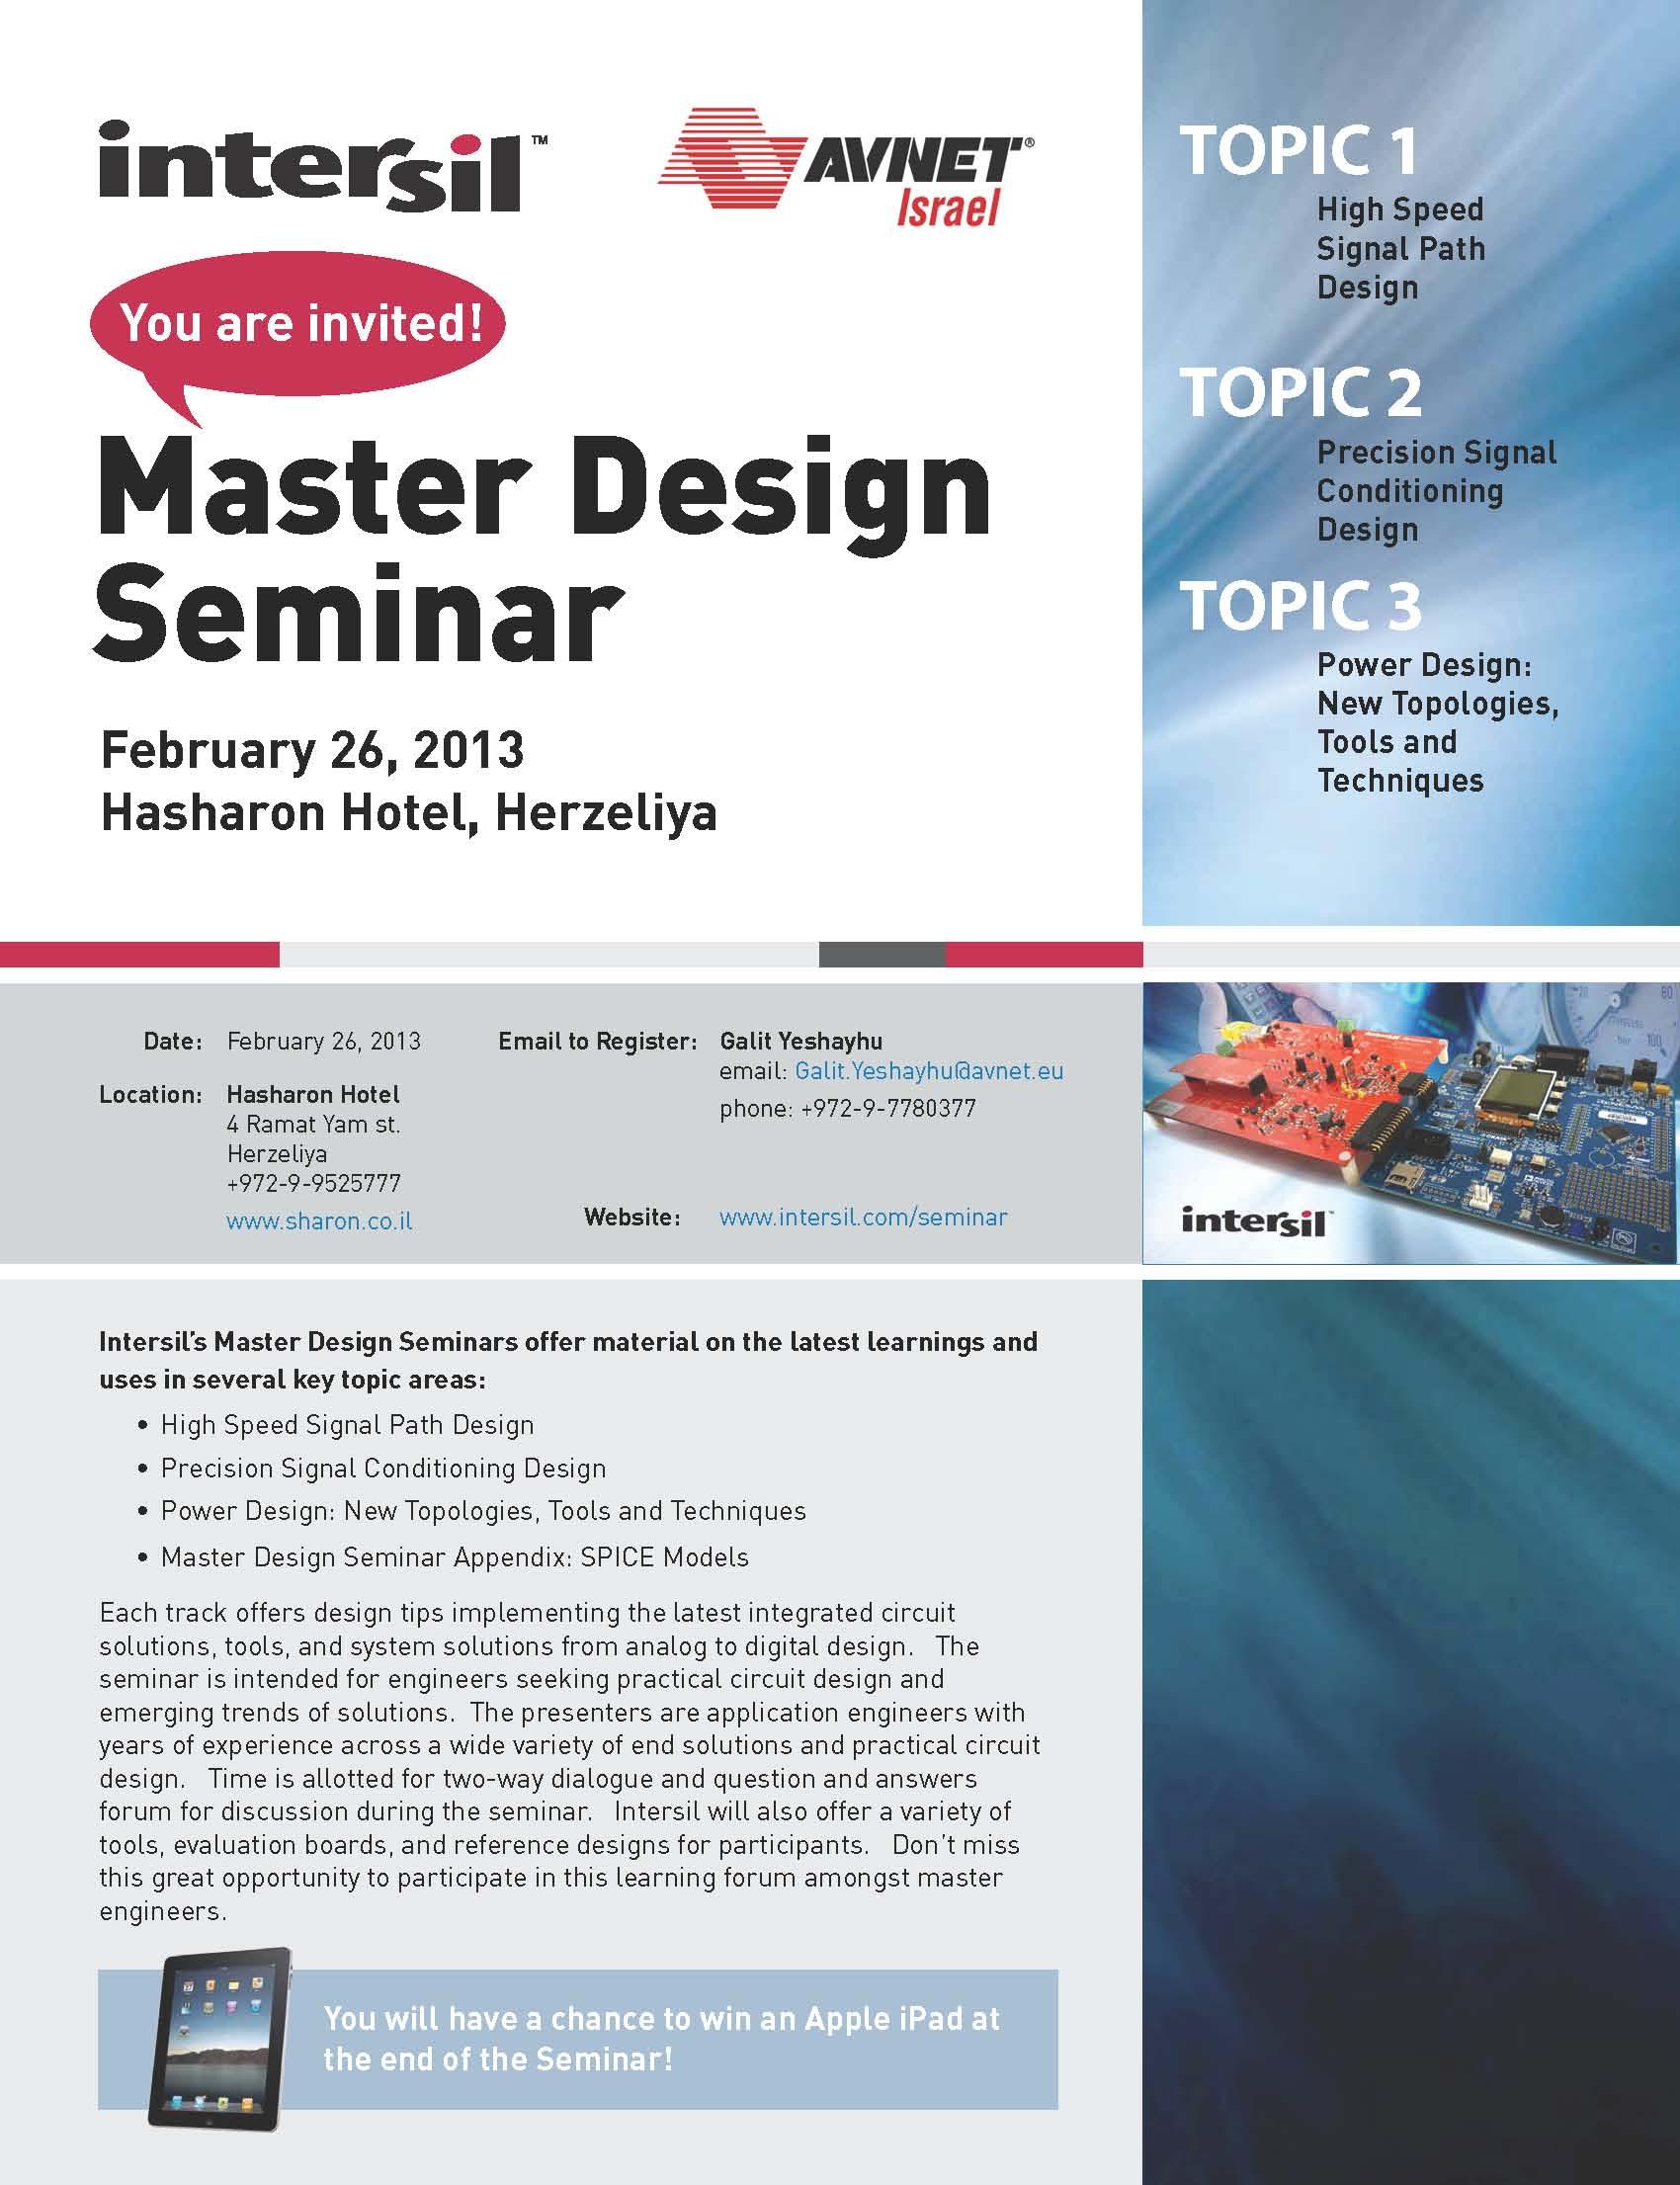 i-HLS Israel Homeland Security AVNET - Intersil Master Design Seminar